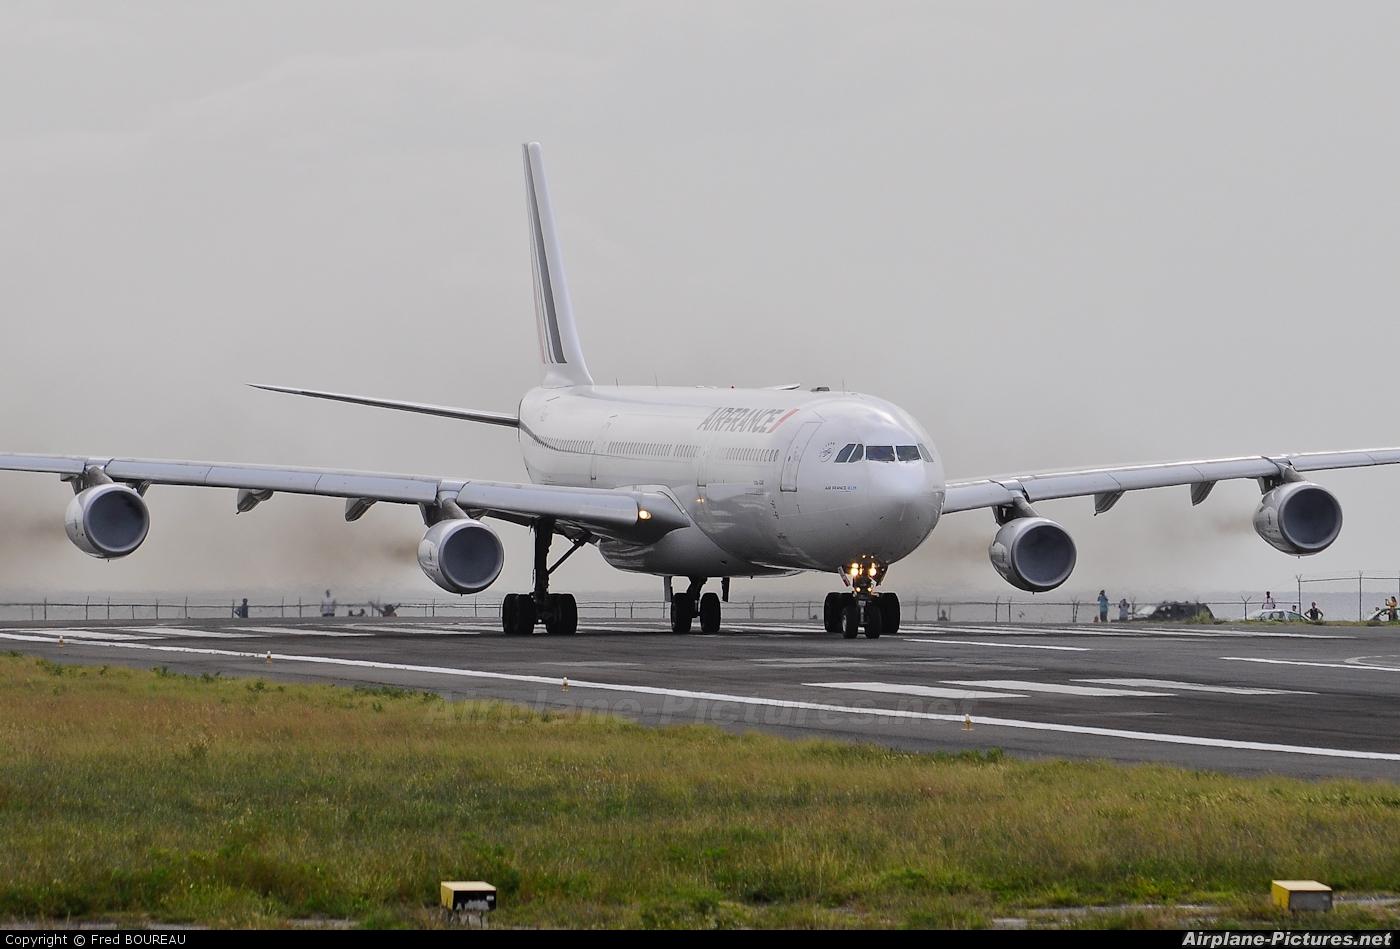 Air France F-GLZL aircraft at Sint Maarten - Princess Juliana Intl